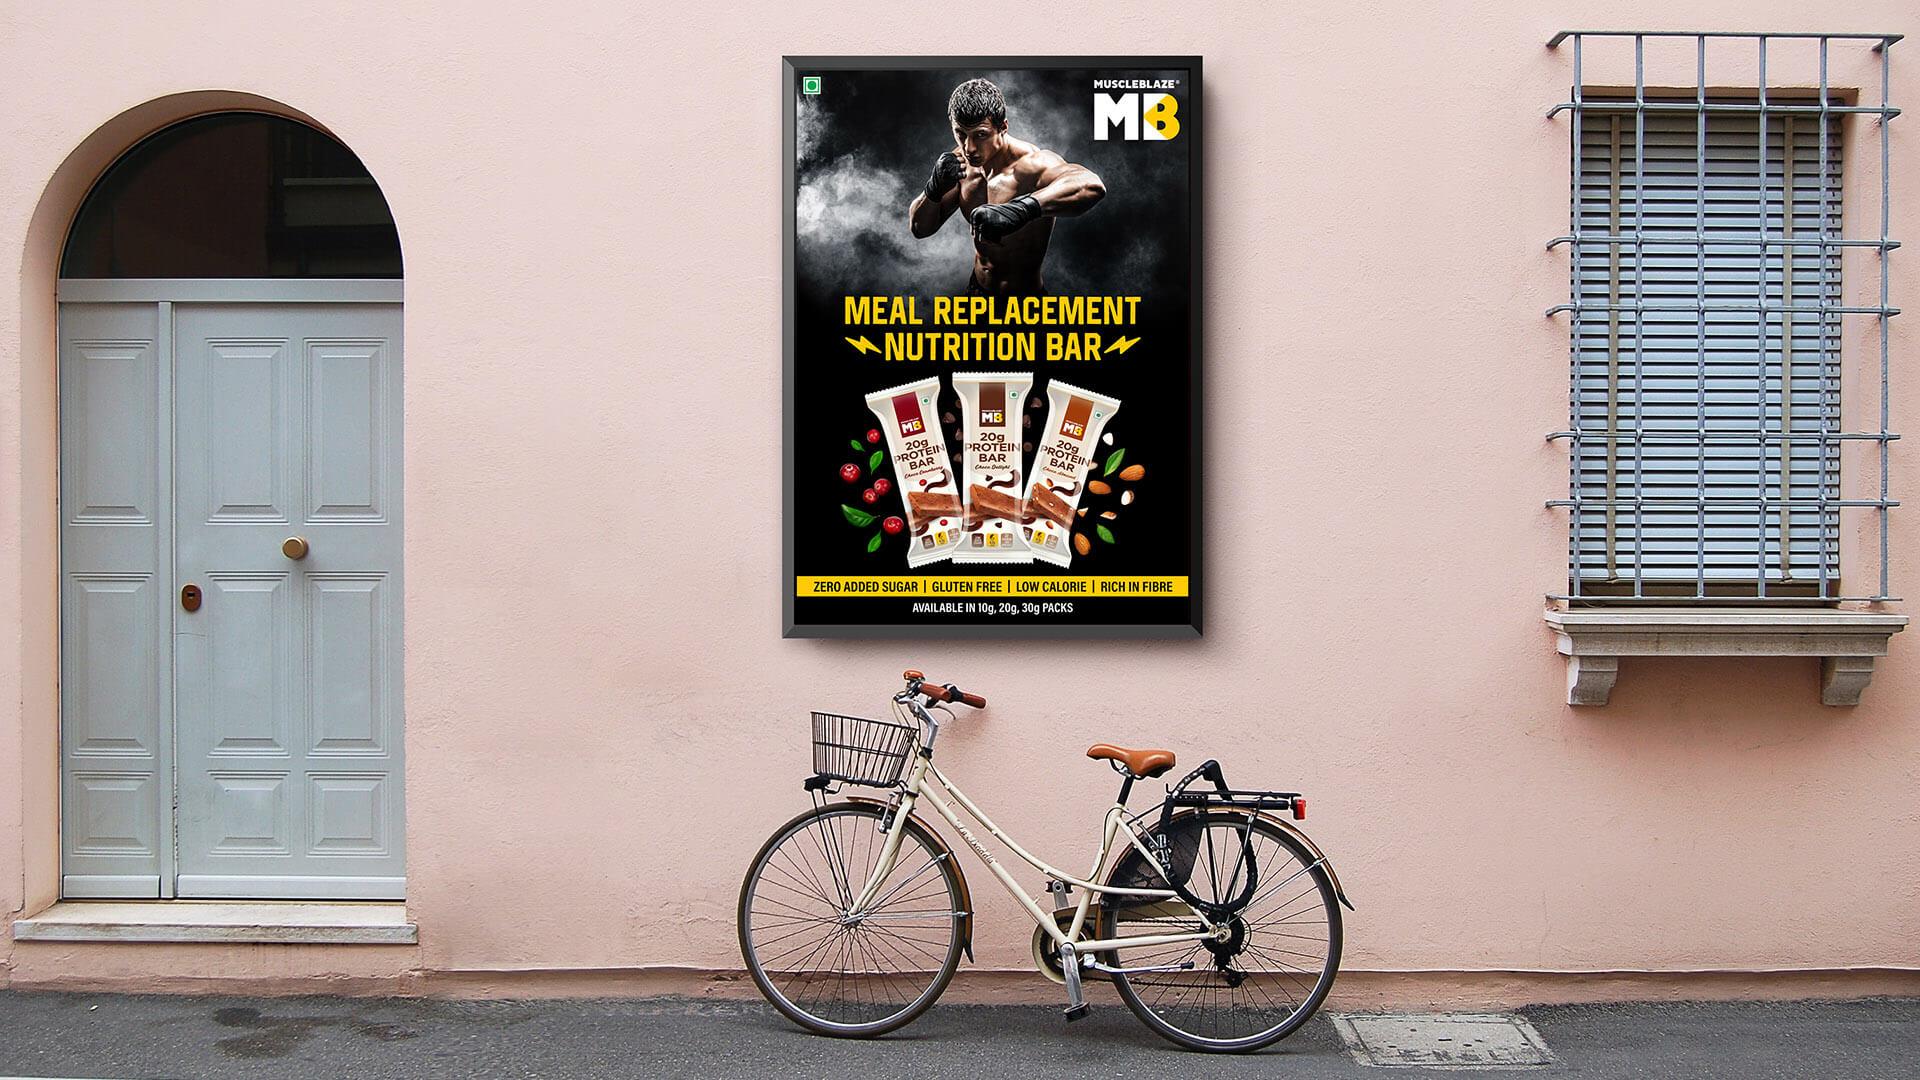 HealthKart-MuscleBlaze-Poster-magazine -ad 2-hd-by-Vatitude